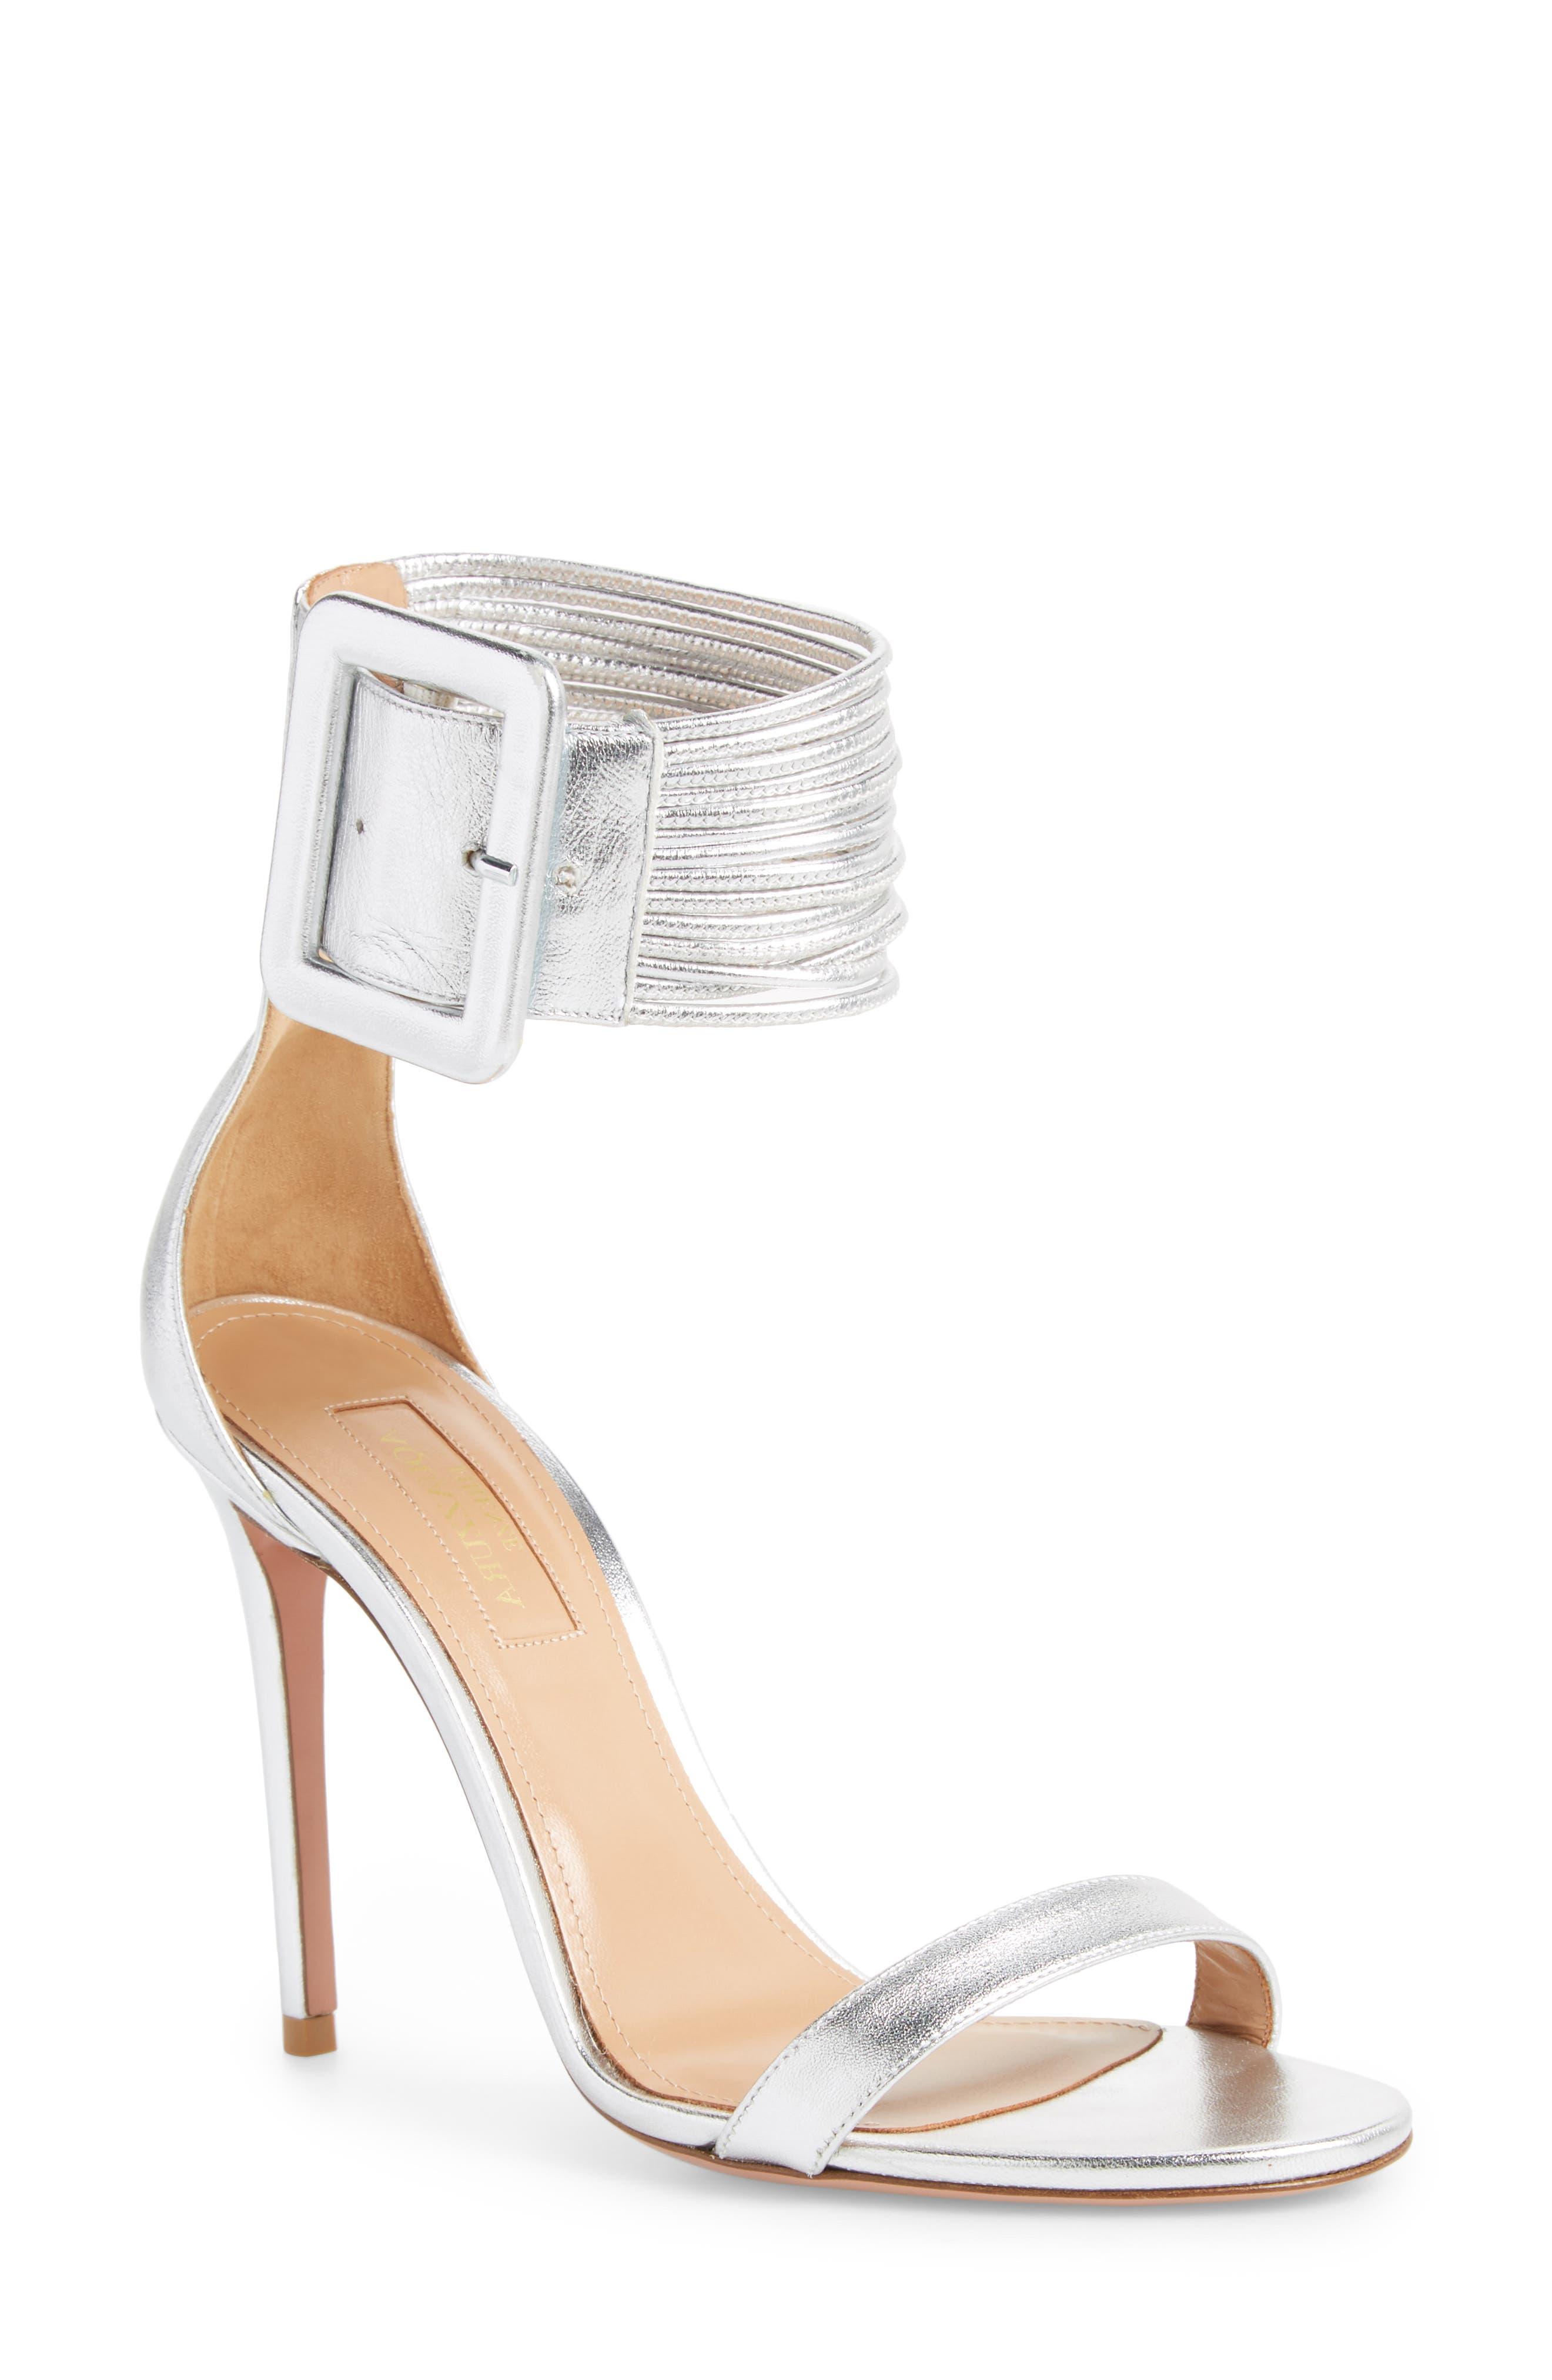 Casablanca Ankle Cuff Sandal,                         Main,                         color, Silver